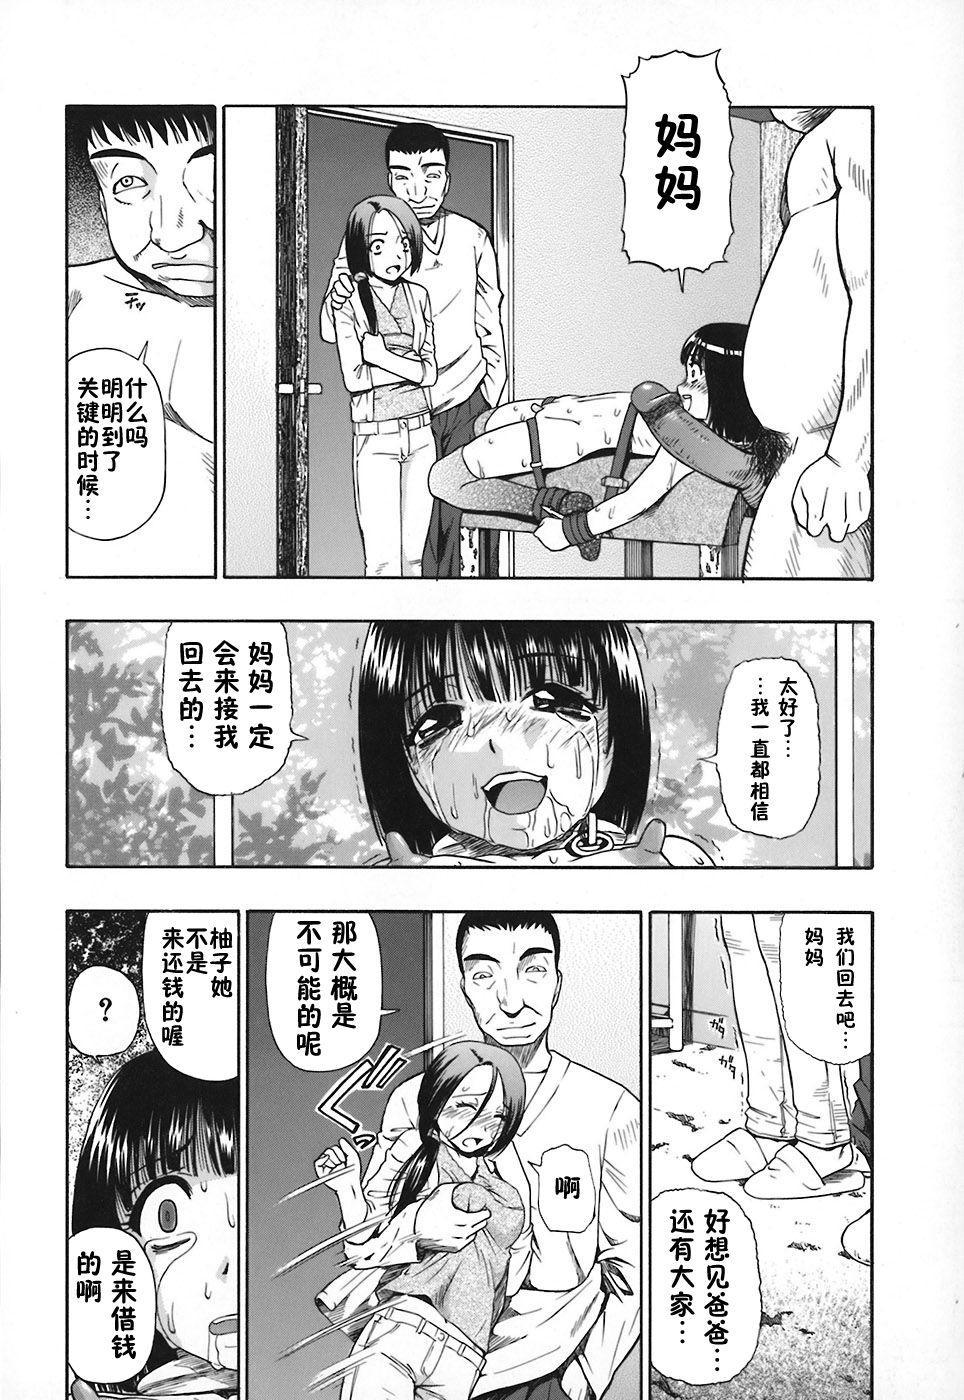 Akutoku no Sakae - Prosperites du Vice 57